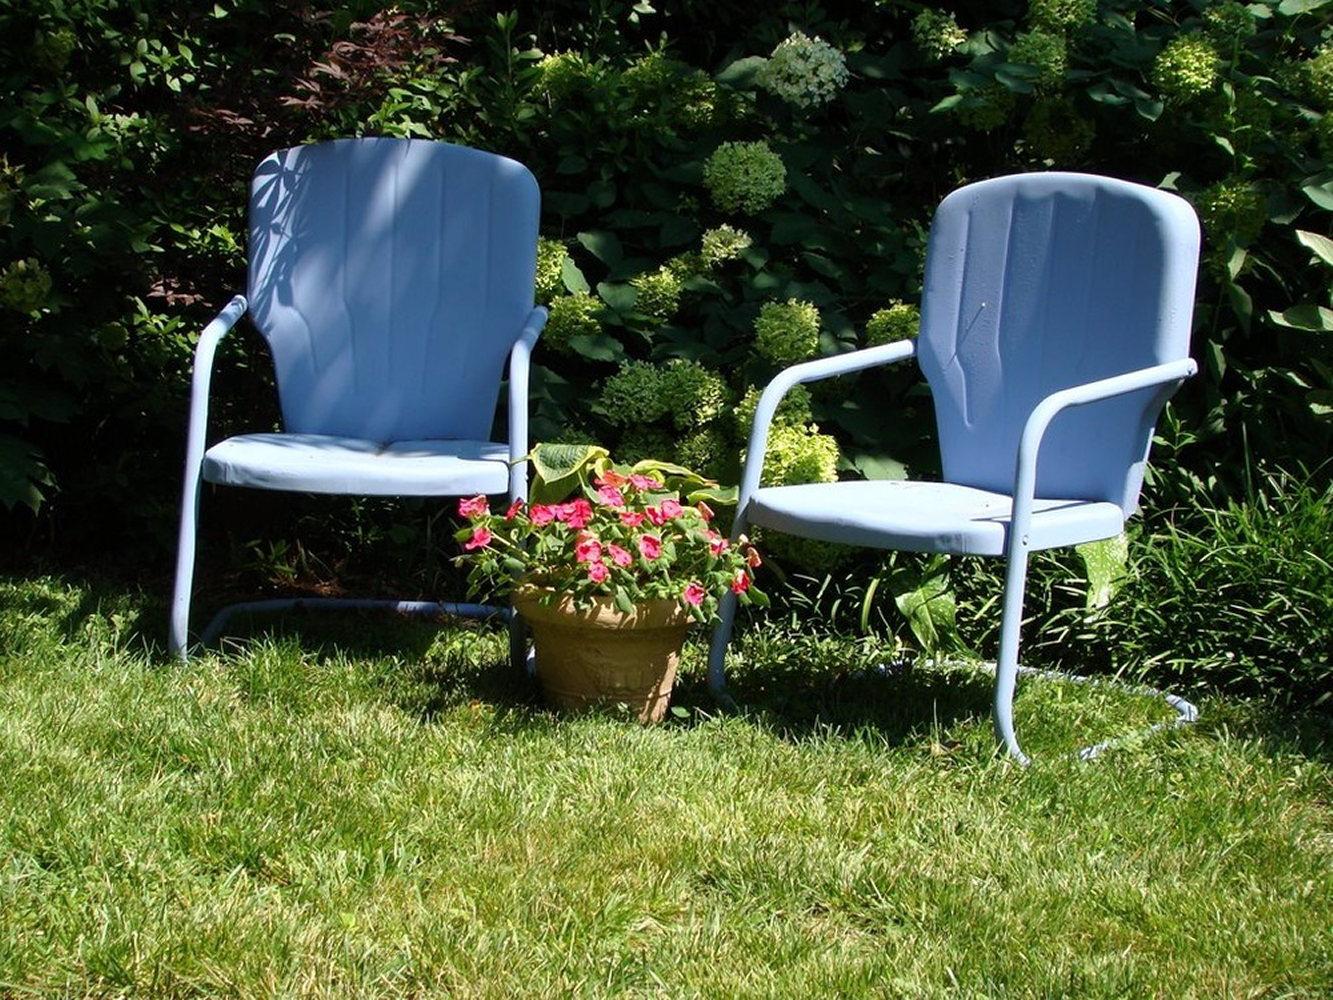 blue-garden-chairs-DSC01002creative-friends-series.JPG